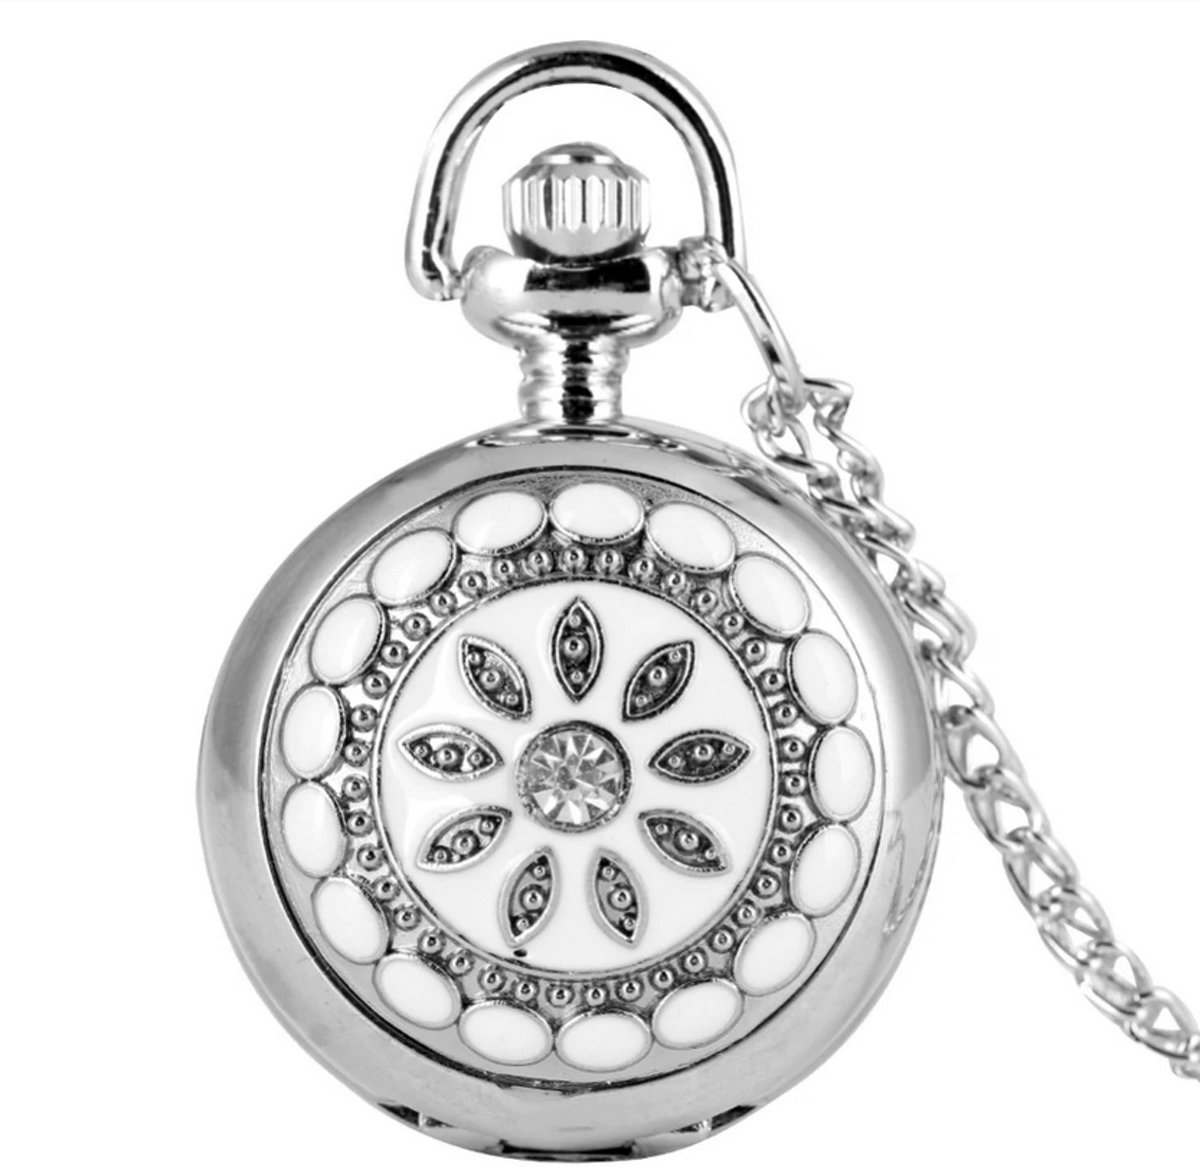 Treasure Trove® Ketting Horloge Vrouwen Bling Steentjes - Dames horloge - 78cm kopen